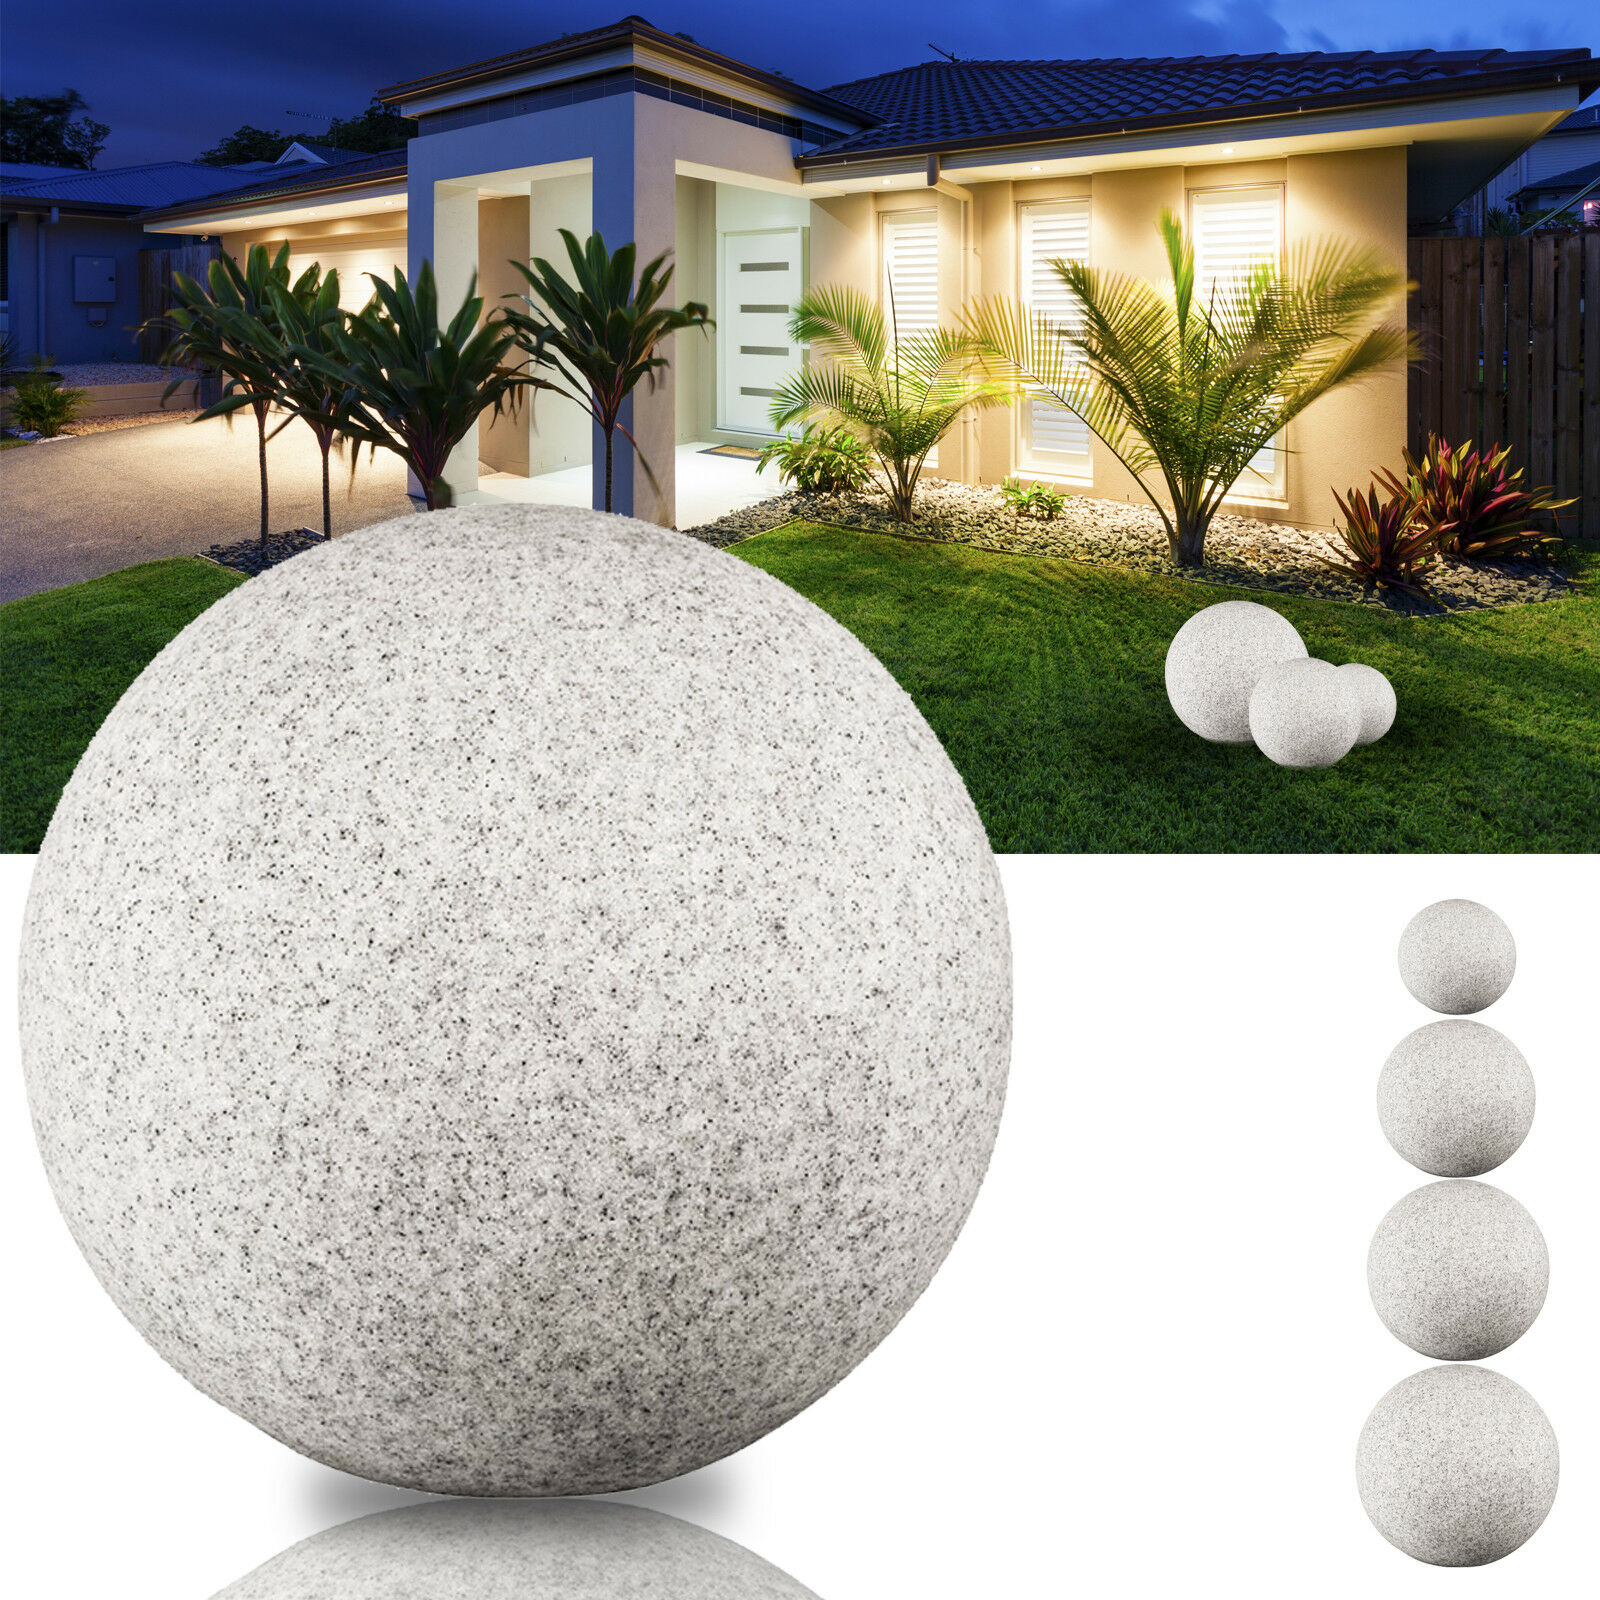 LED Kugelleuchte Leuchtkugel Gartenleuchte Ø20/30/40/50cm Naturstein Optik E27